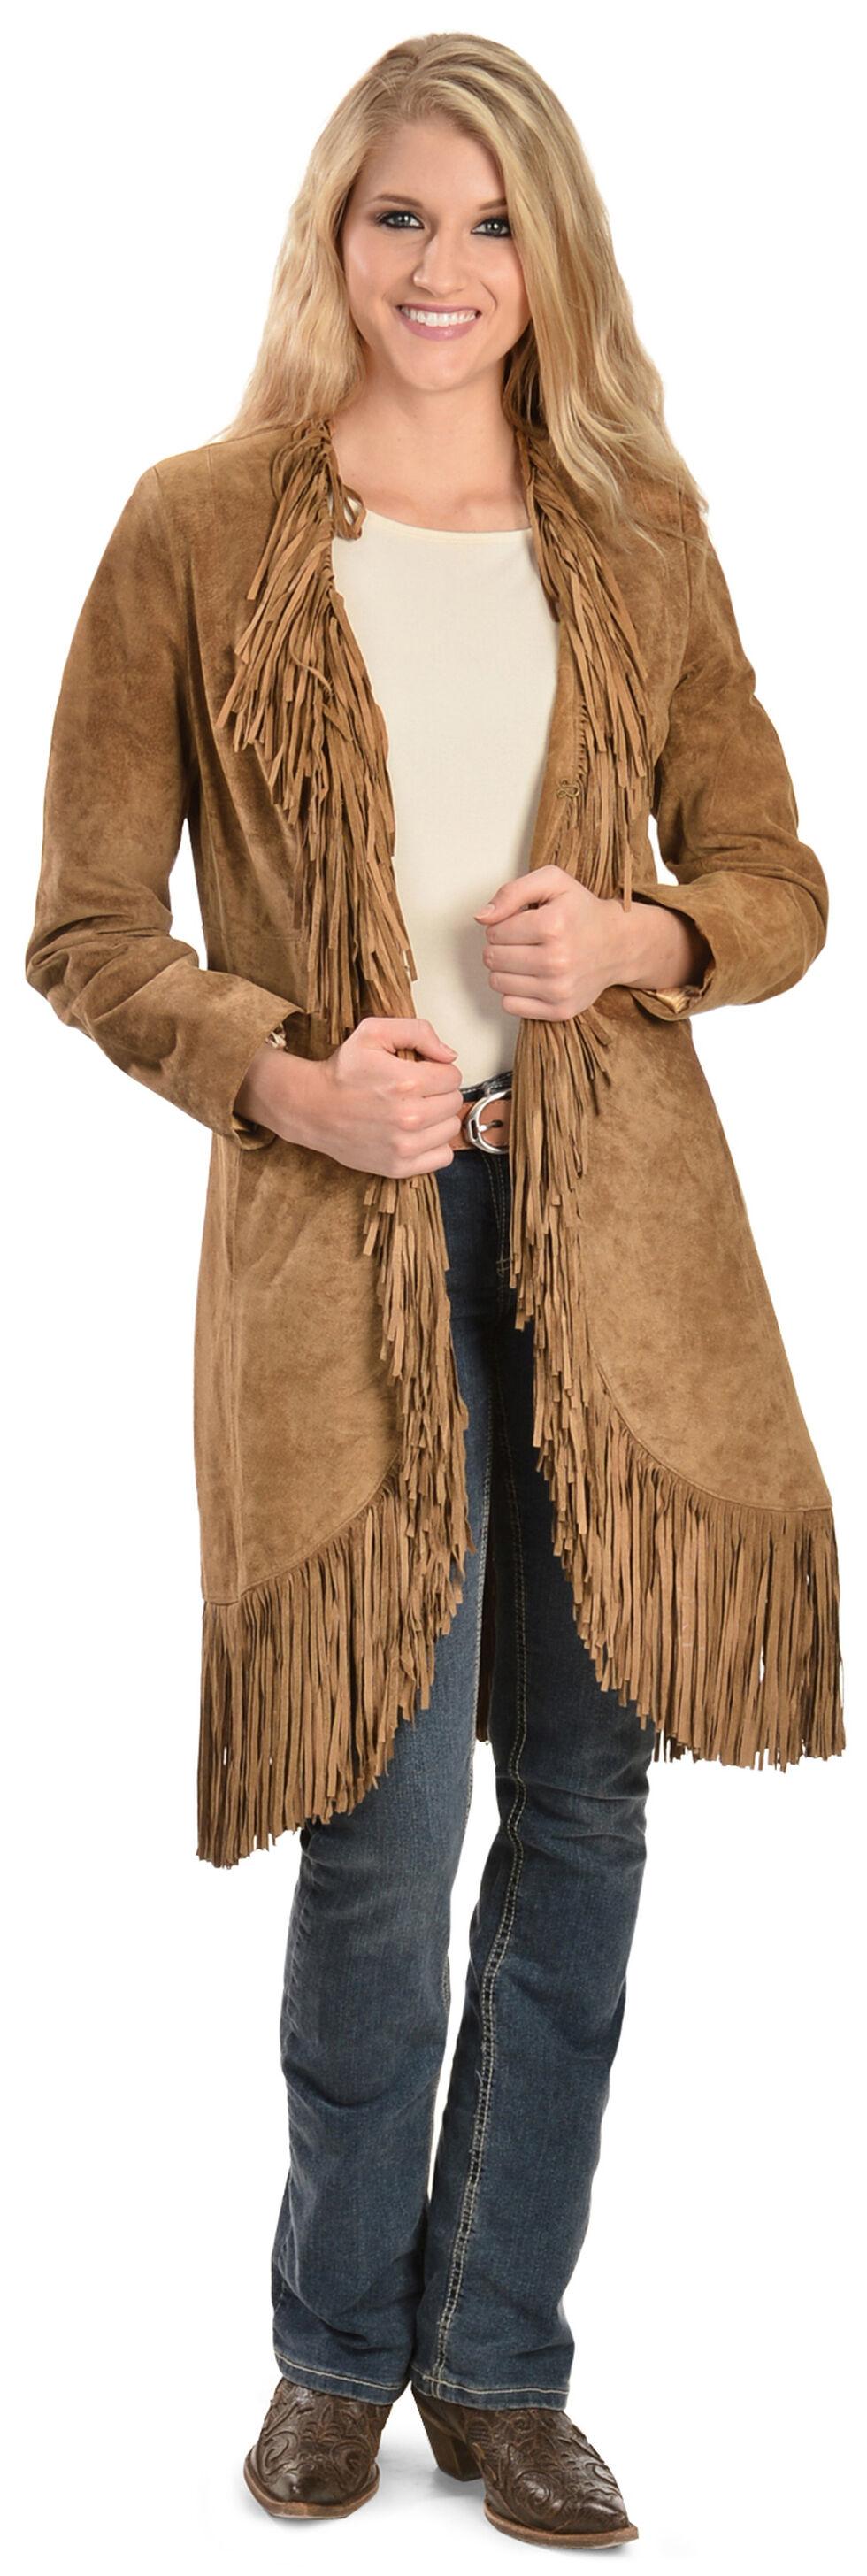 Scully Boar Suede Fringed Maxi Coat, Cinnamon, hi-res